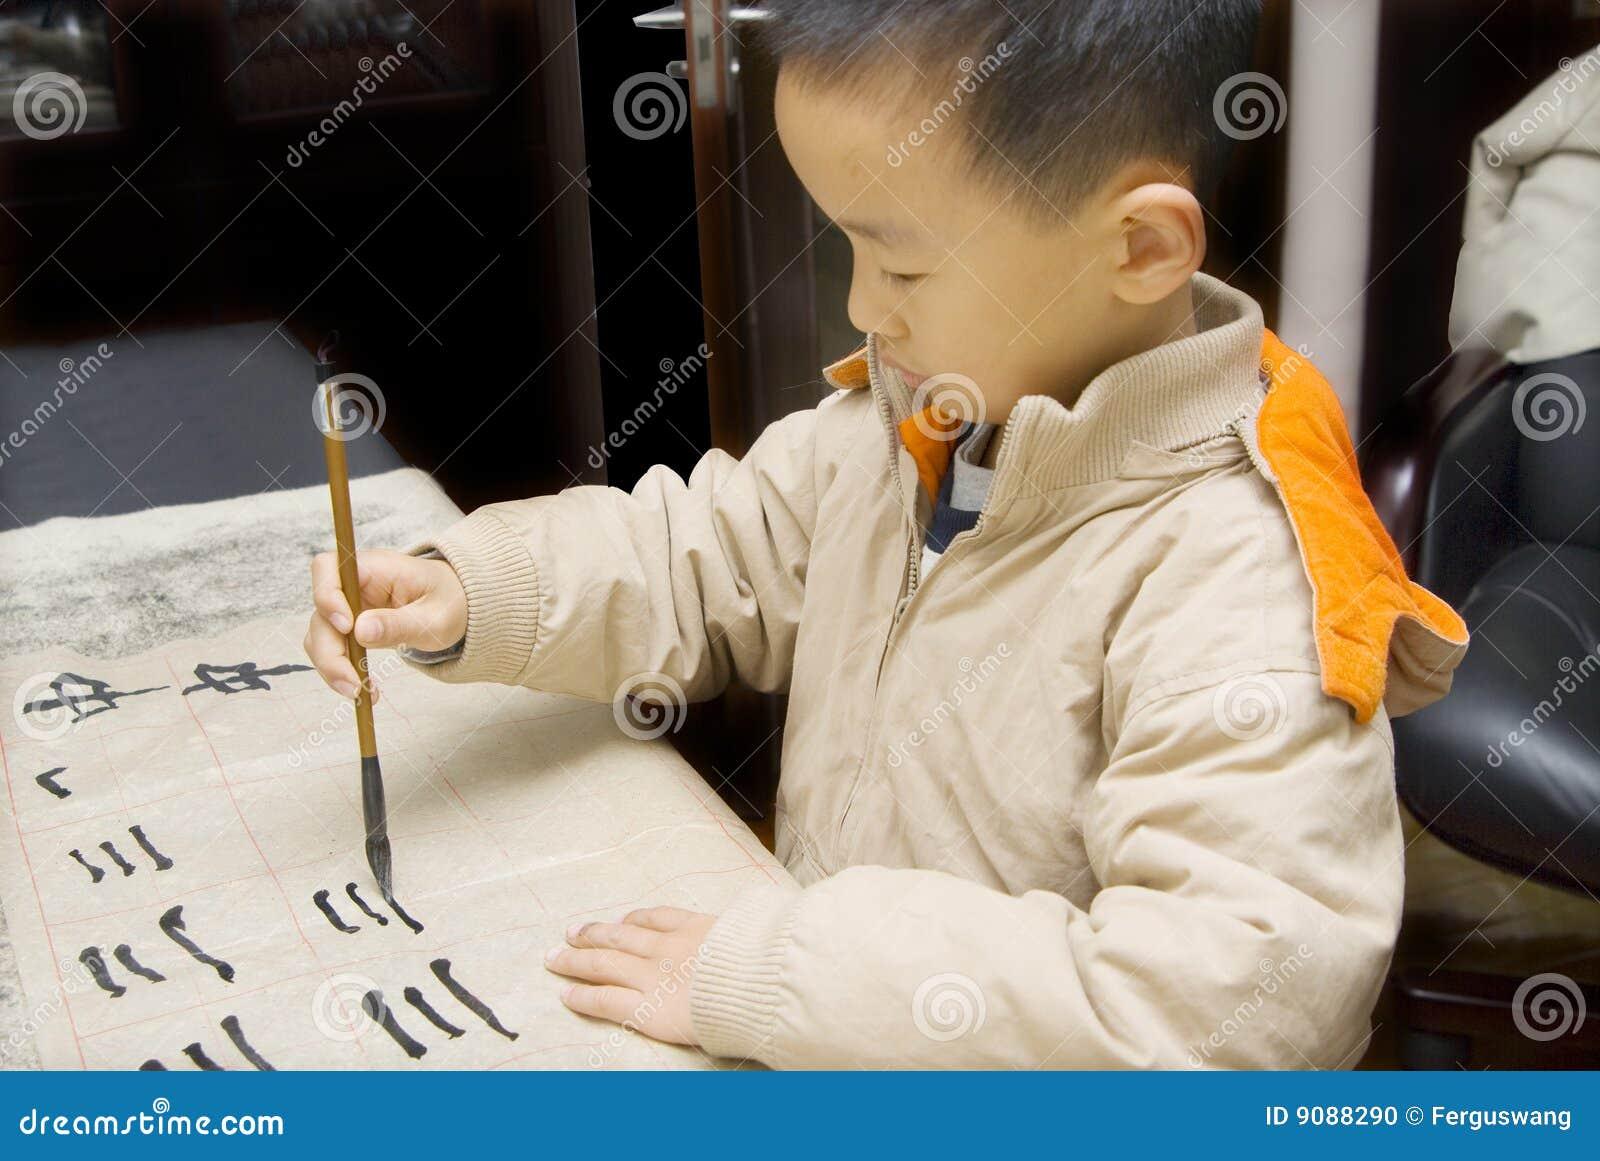 Kinesisk writing för calligraphybarn